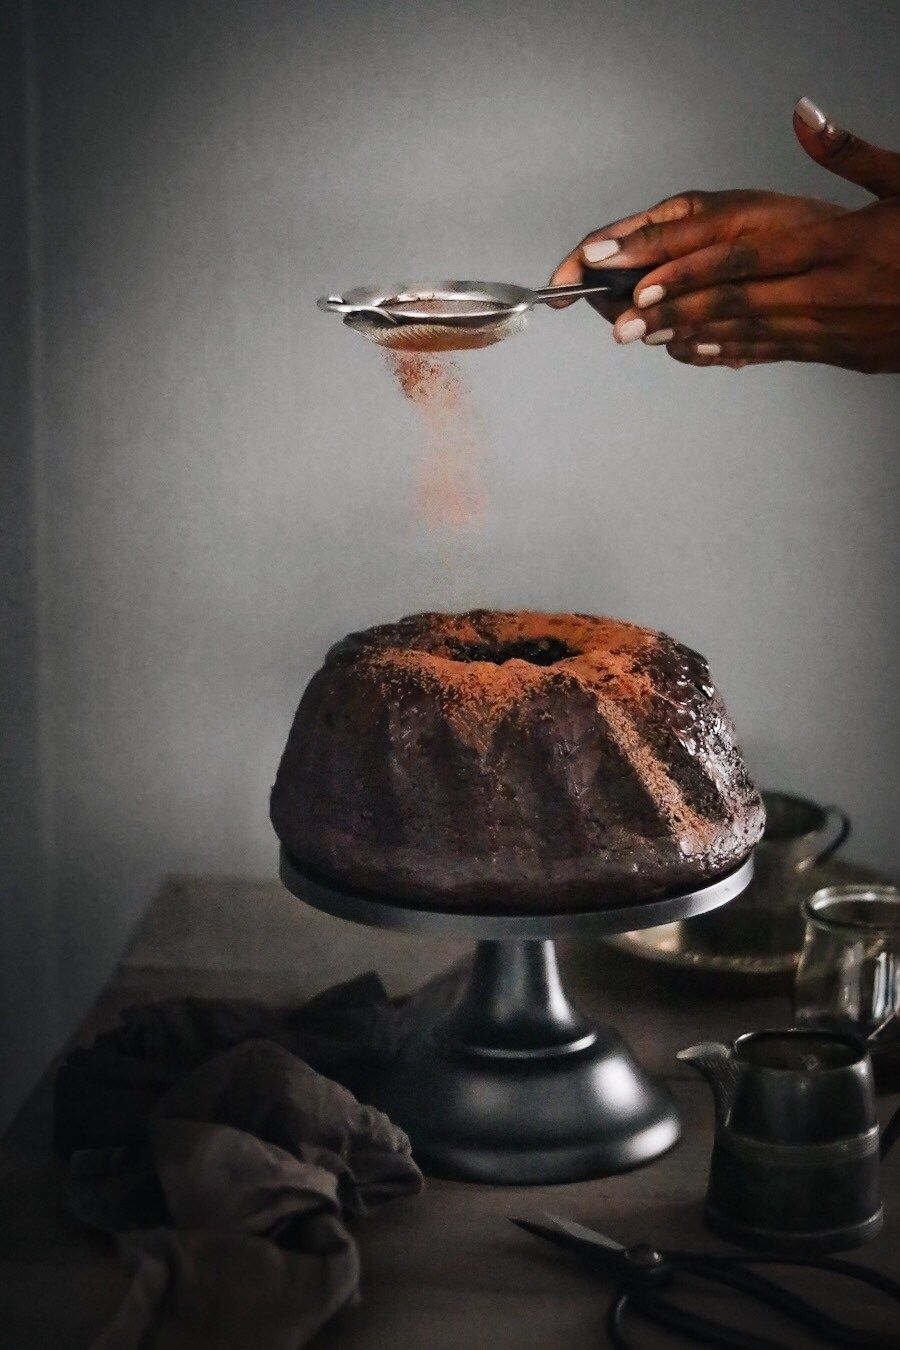 Chocolate cheesecake bundt cake in 2020 creamy chocolate